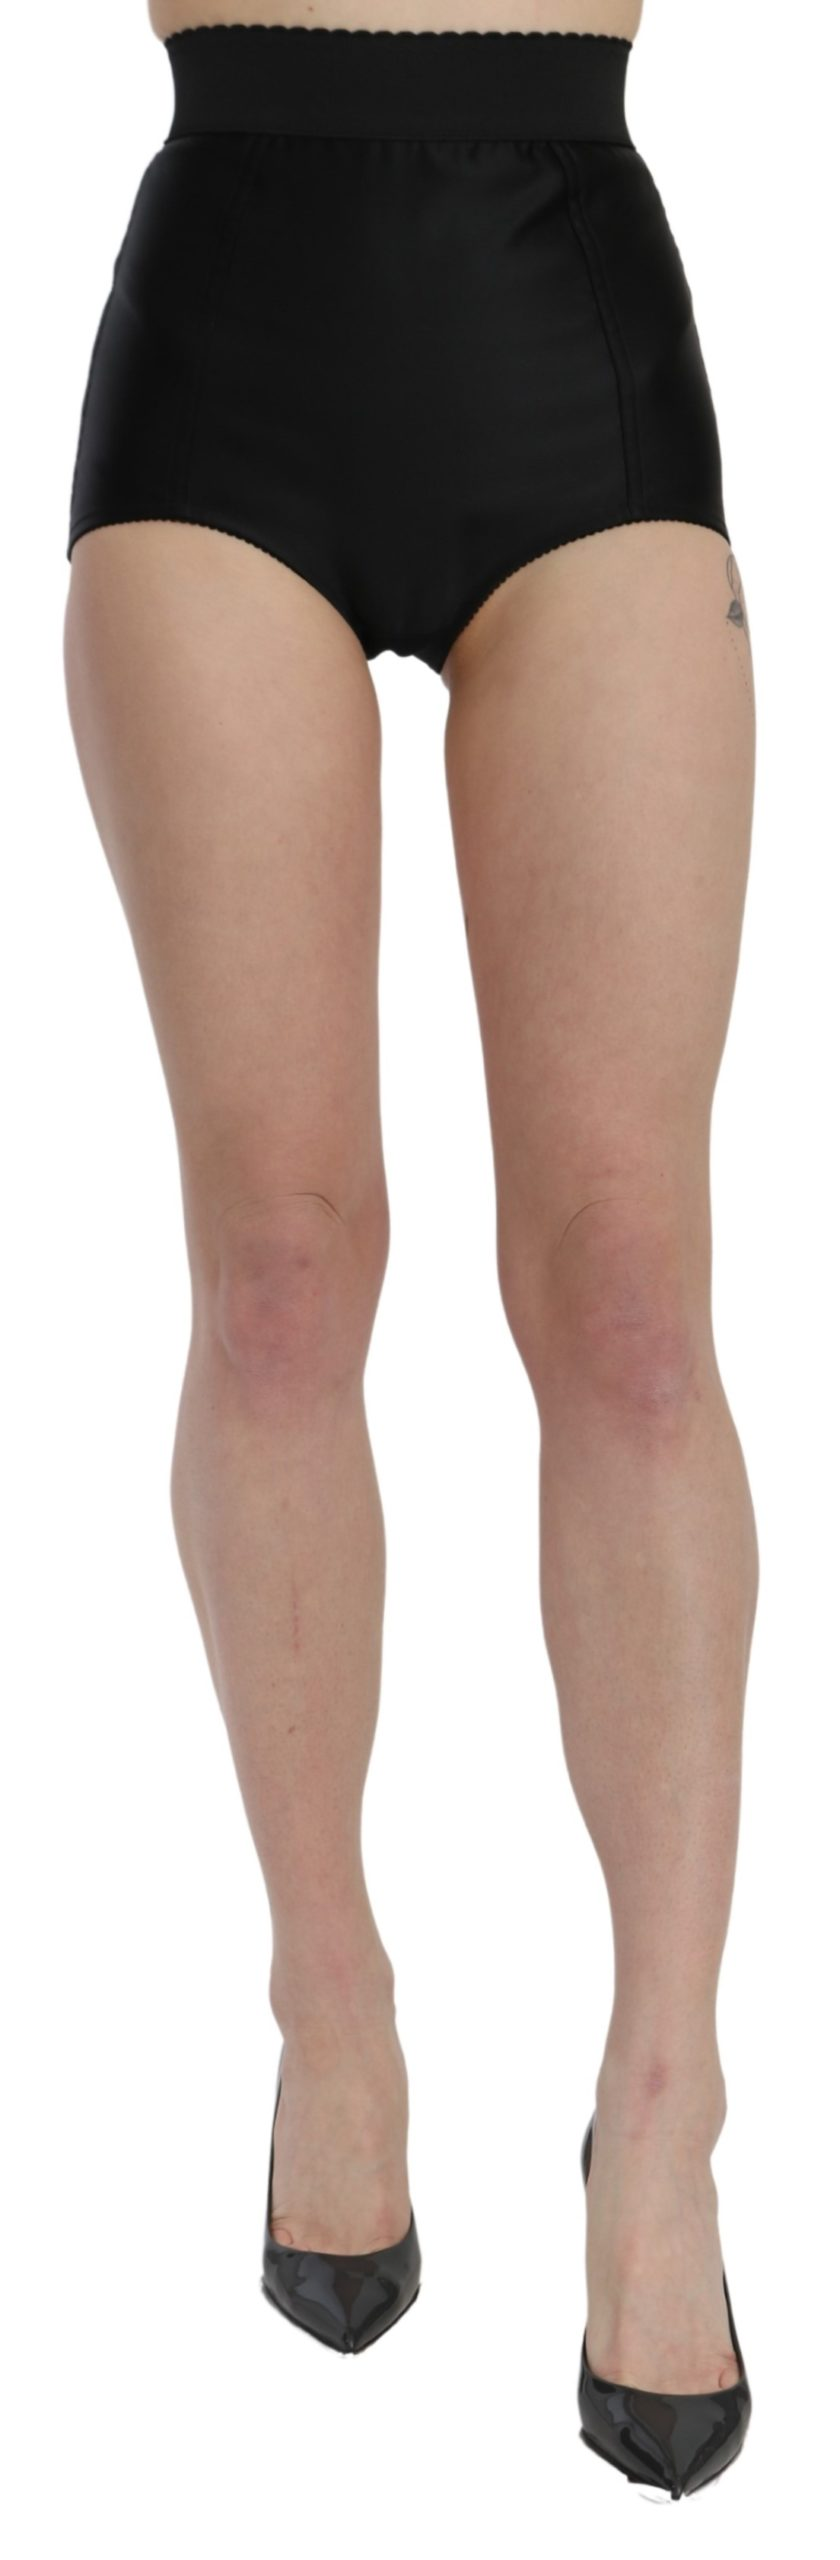 Dolce & Gabbana Women's High Waist Mini Hot Pants Nylon Shorts Black SKI1441 - IT36   XS